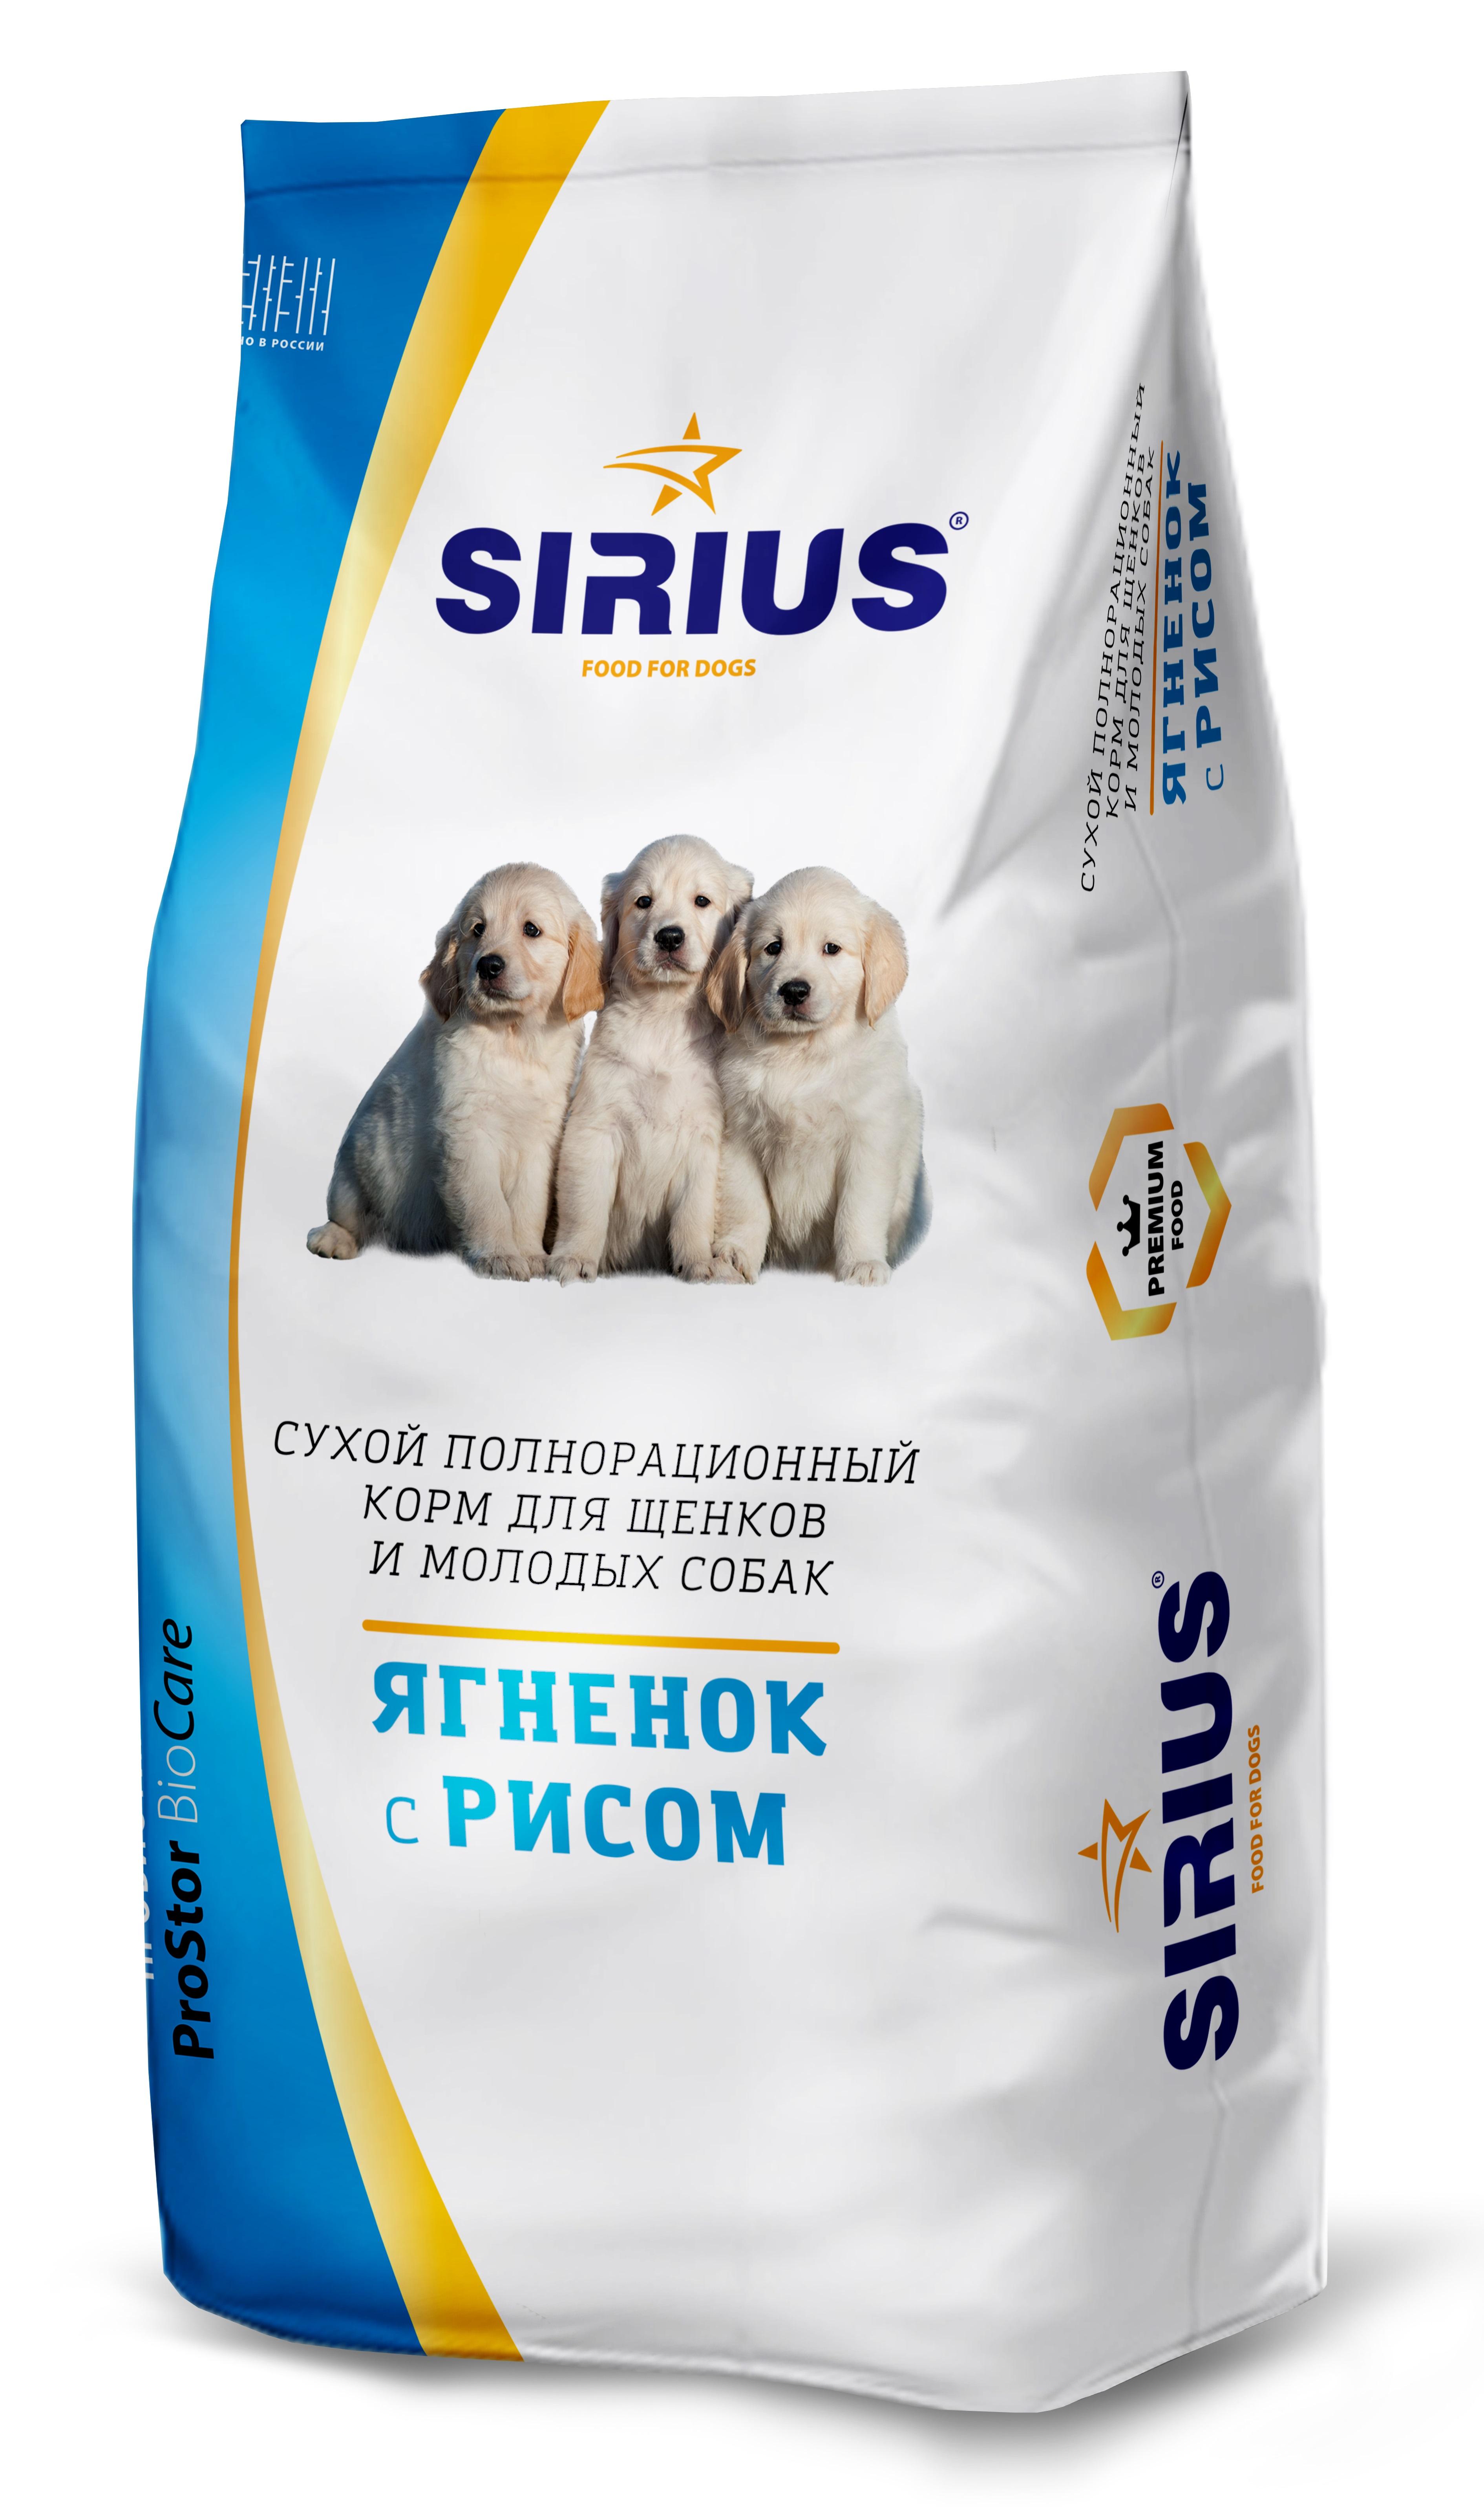 Сухой корм для щенков SIRIUS со вкусом ягненка и риса, 20 кг